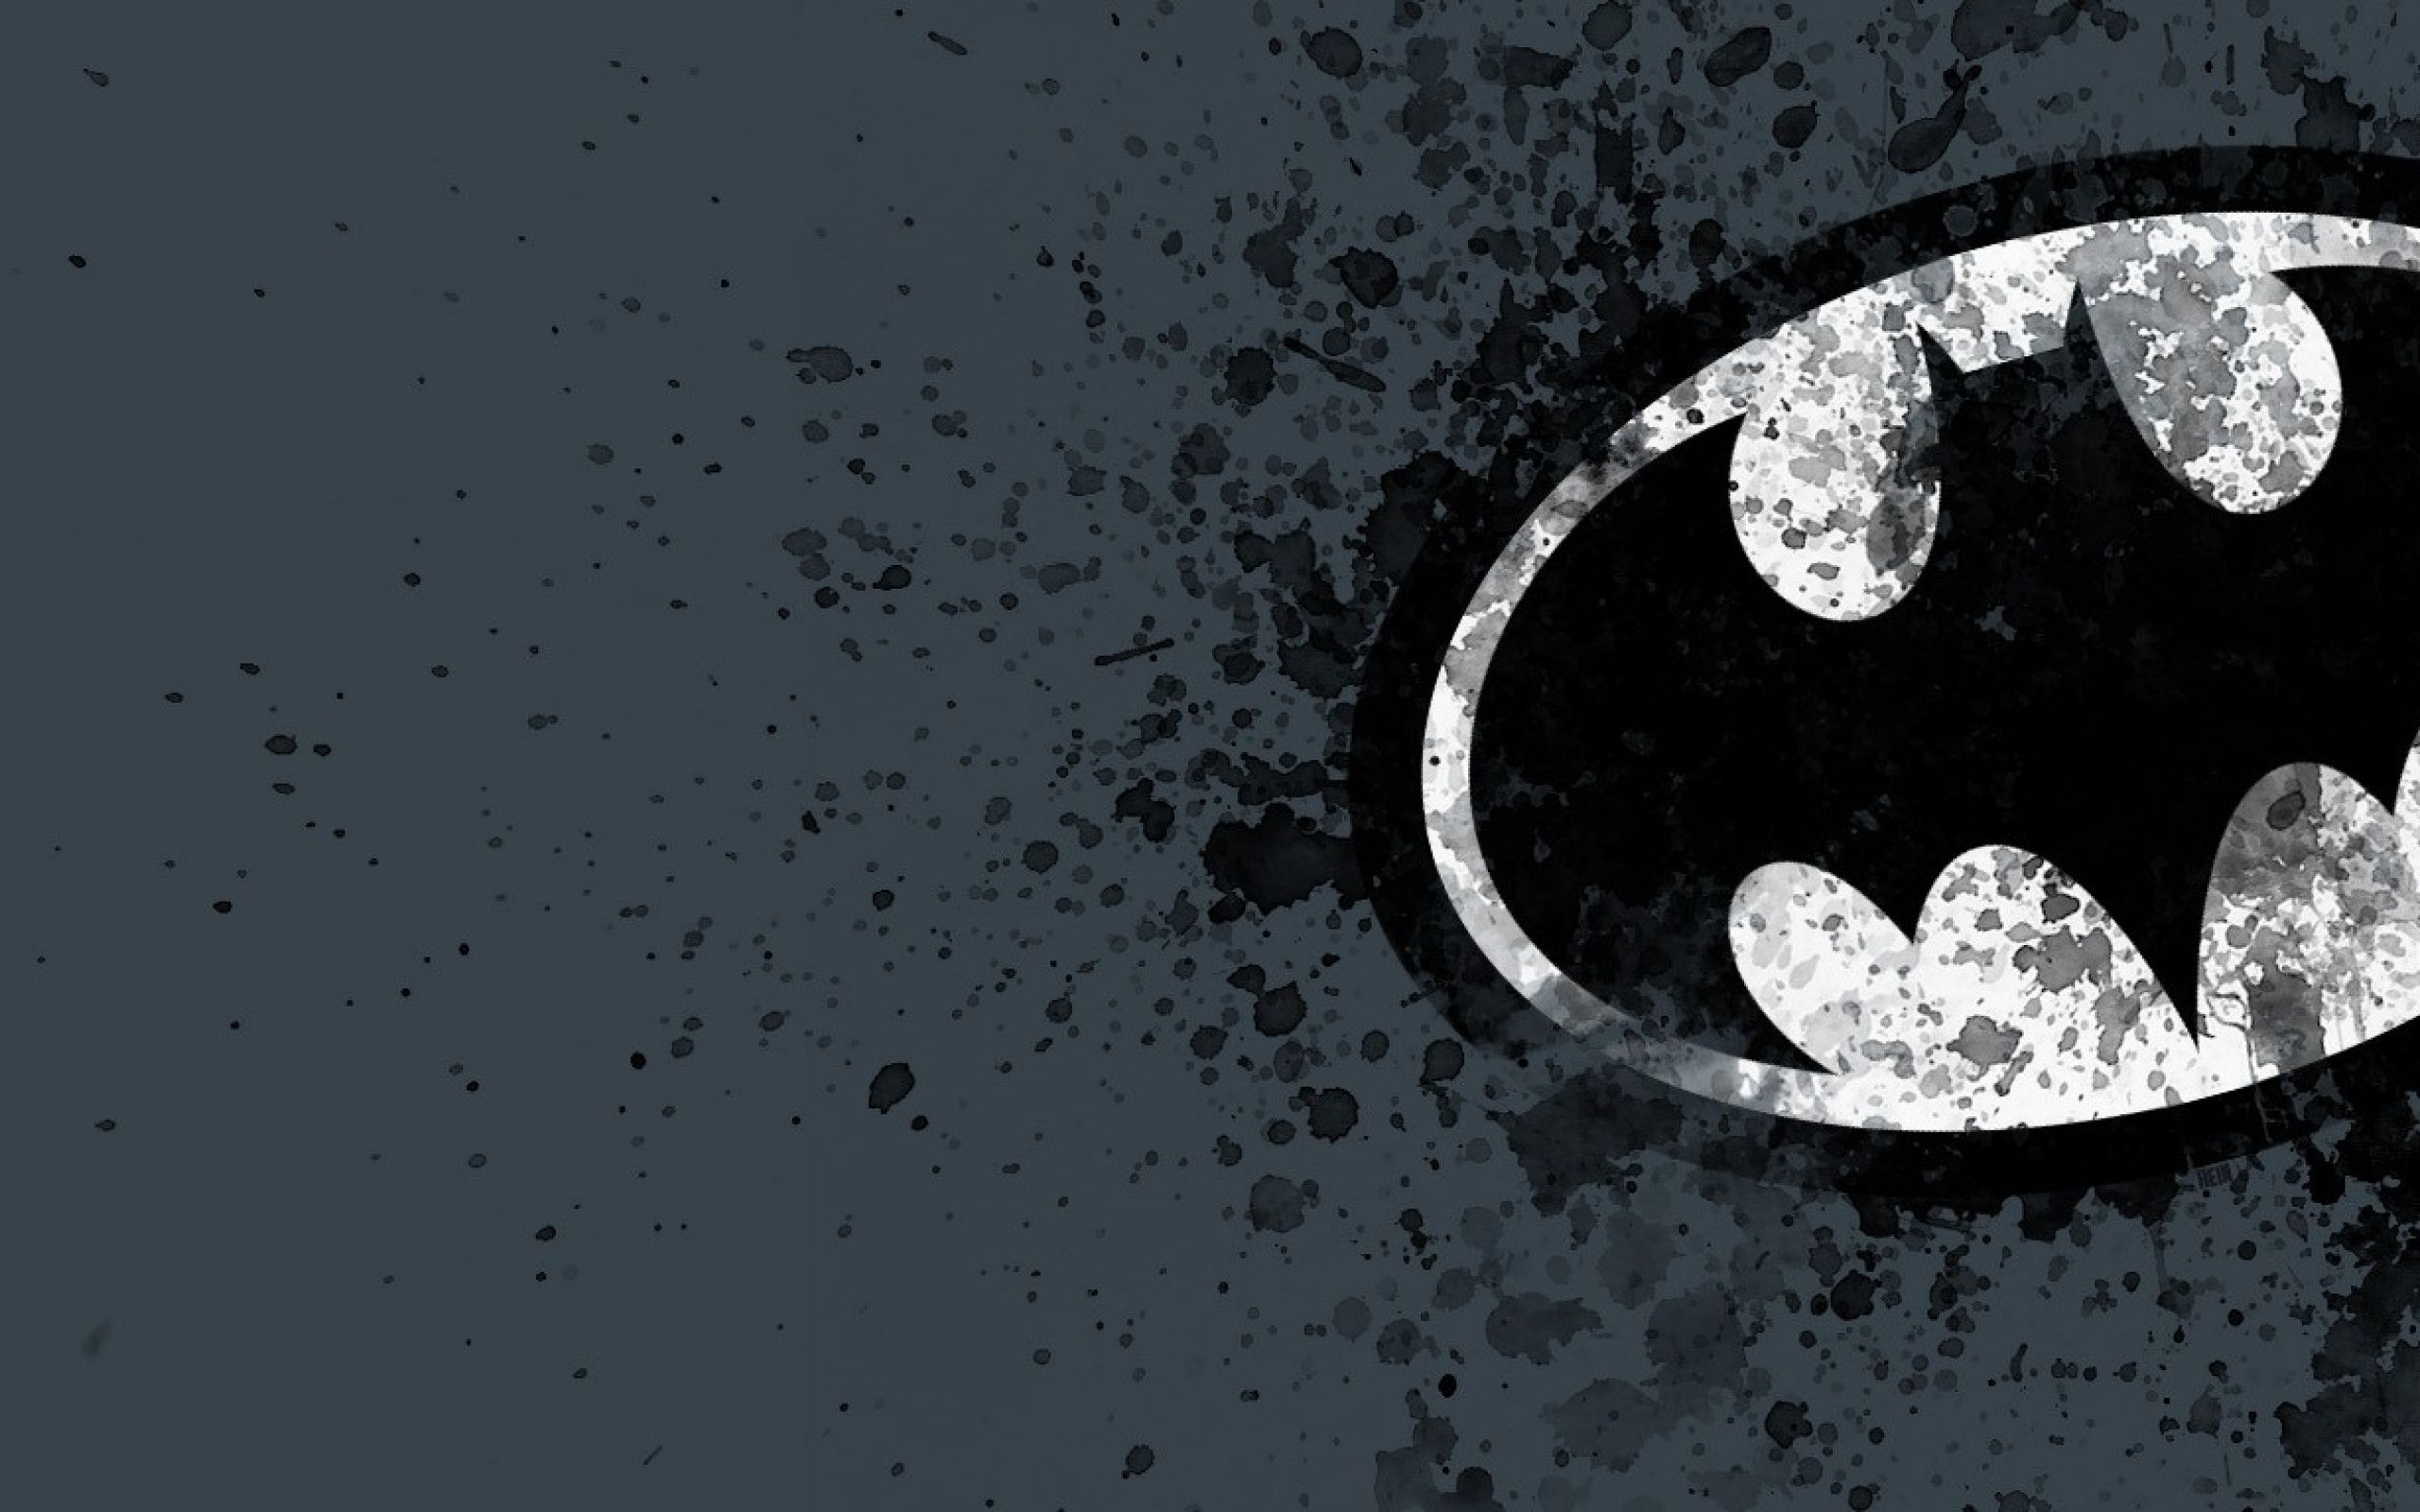 Batman Wallpapers   Full HD wallpaper search 2560x1600